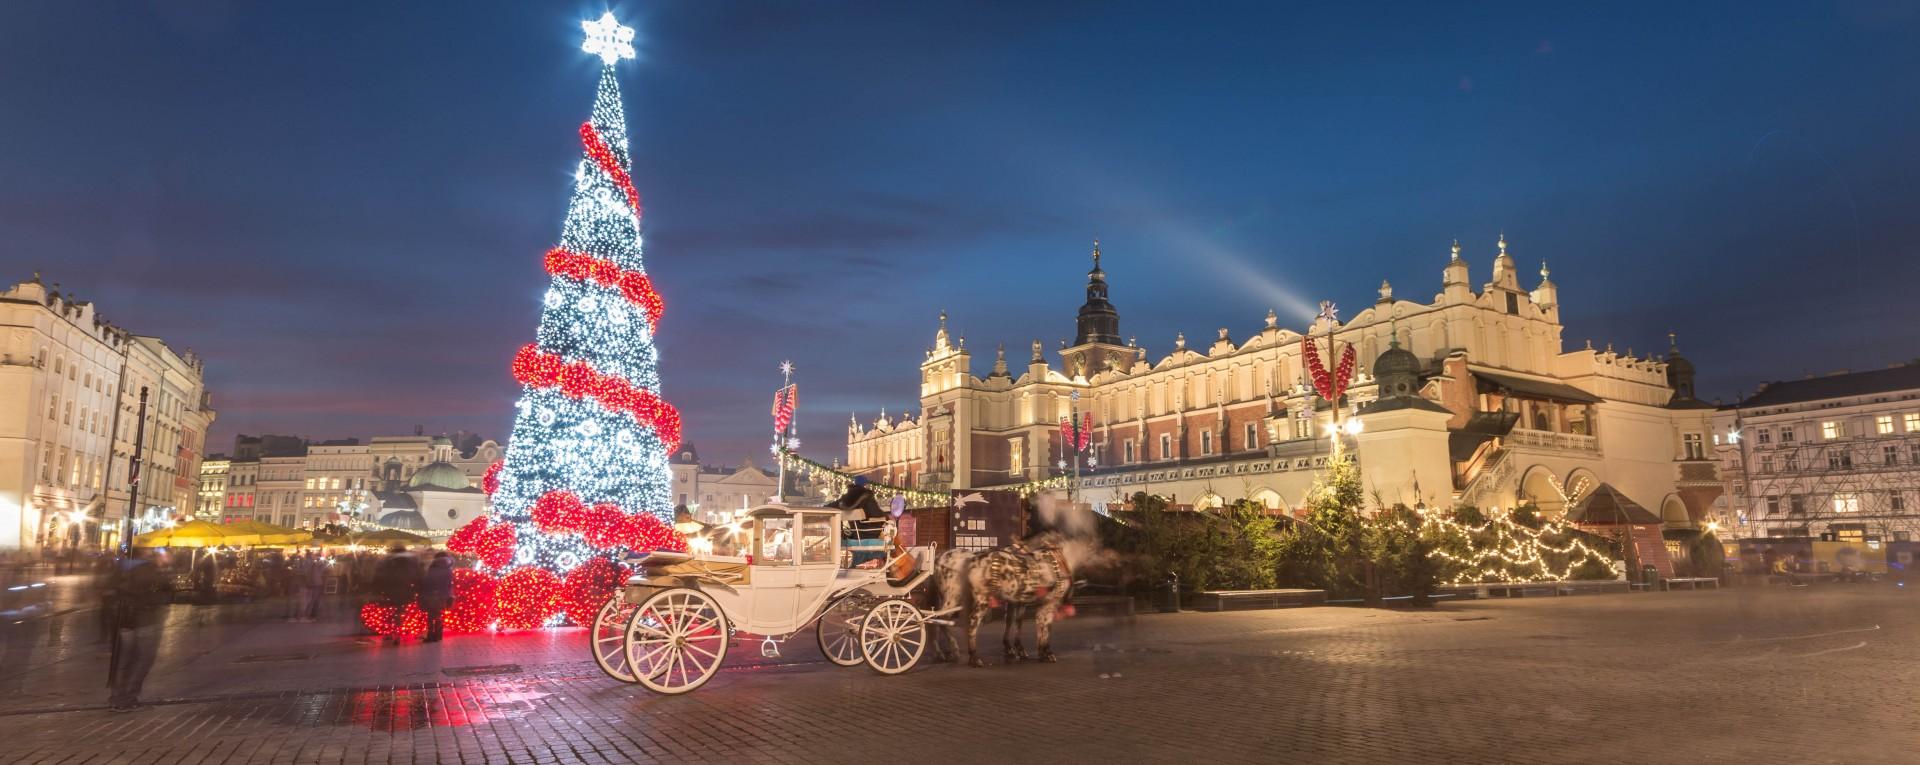 Krakow Travel Tours